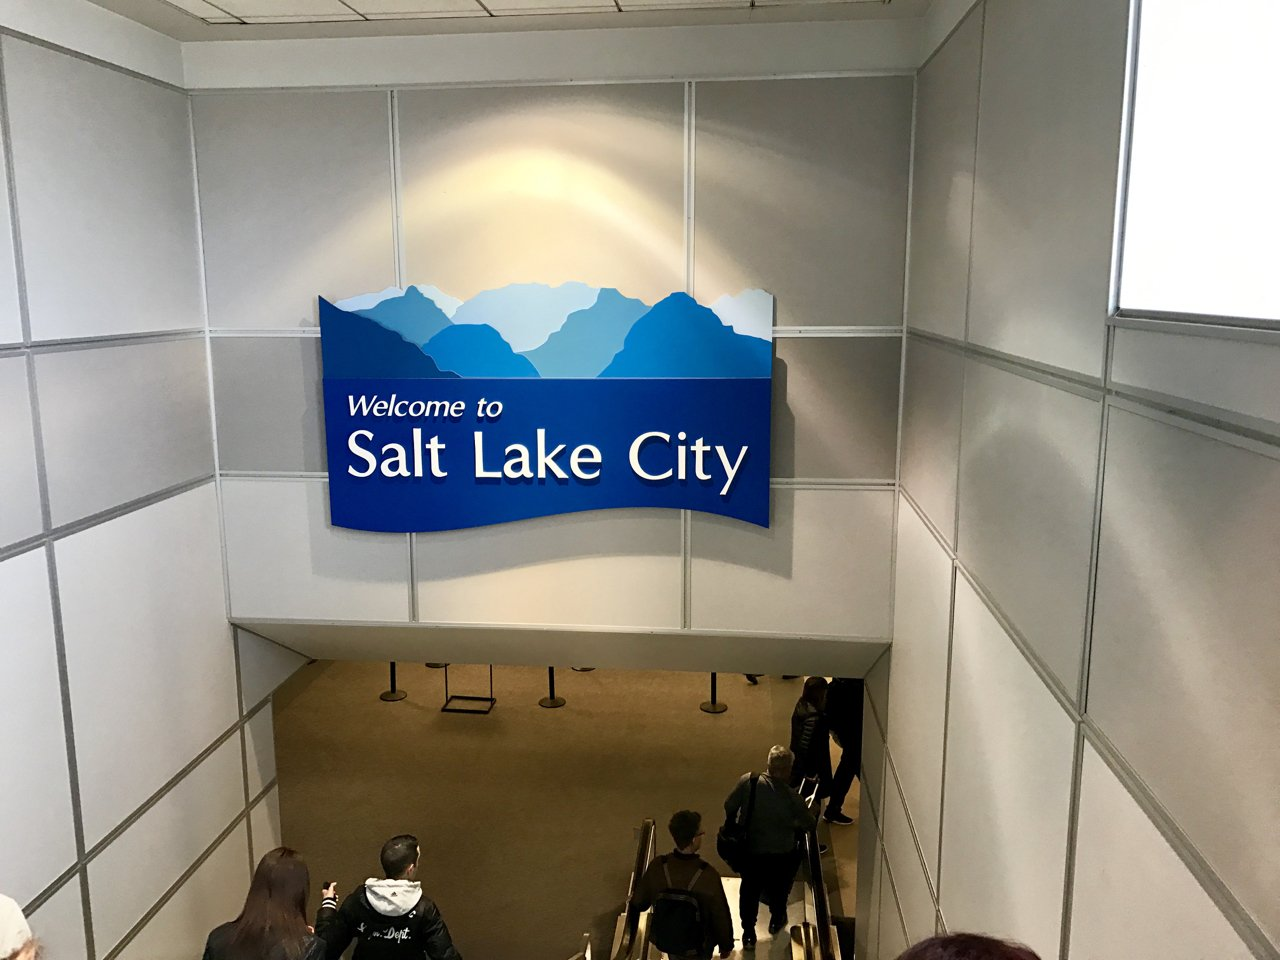 Bienvenidos a Salt Lake City